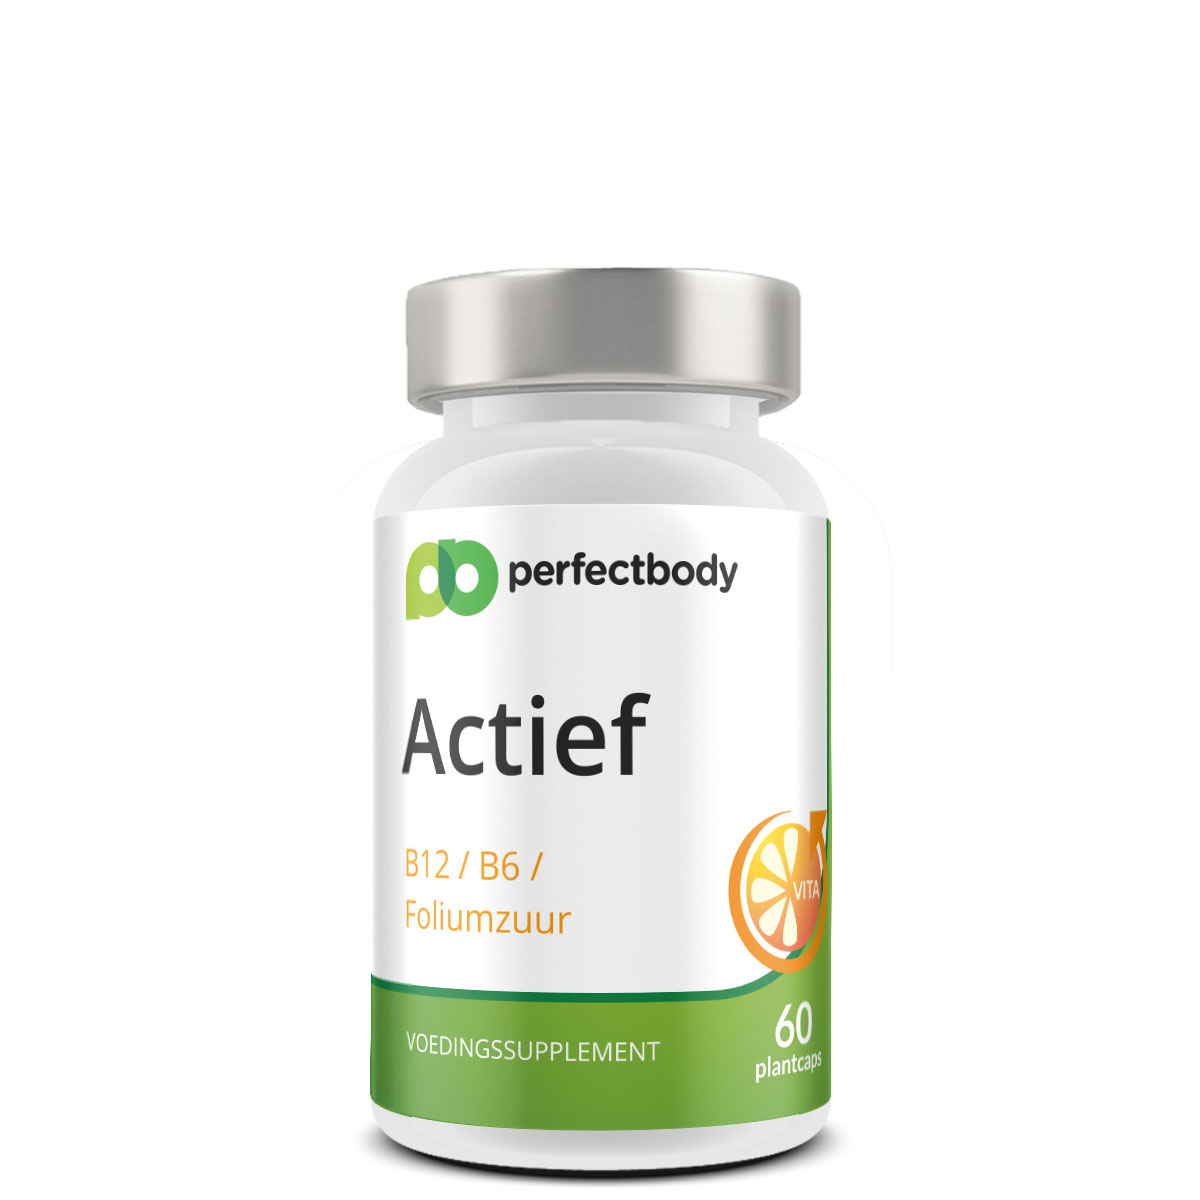 Perfectbody Vitamine B6, B12 En Foliumzuur - 60 Plantcapsules